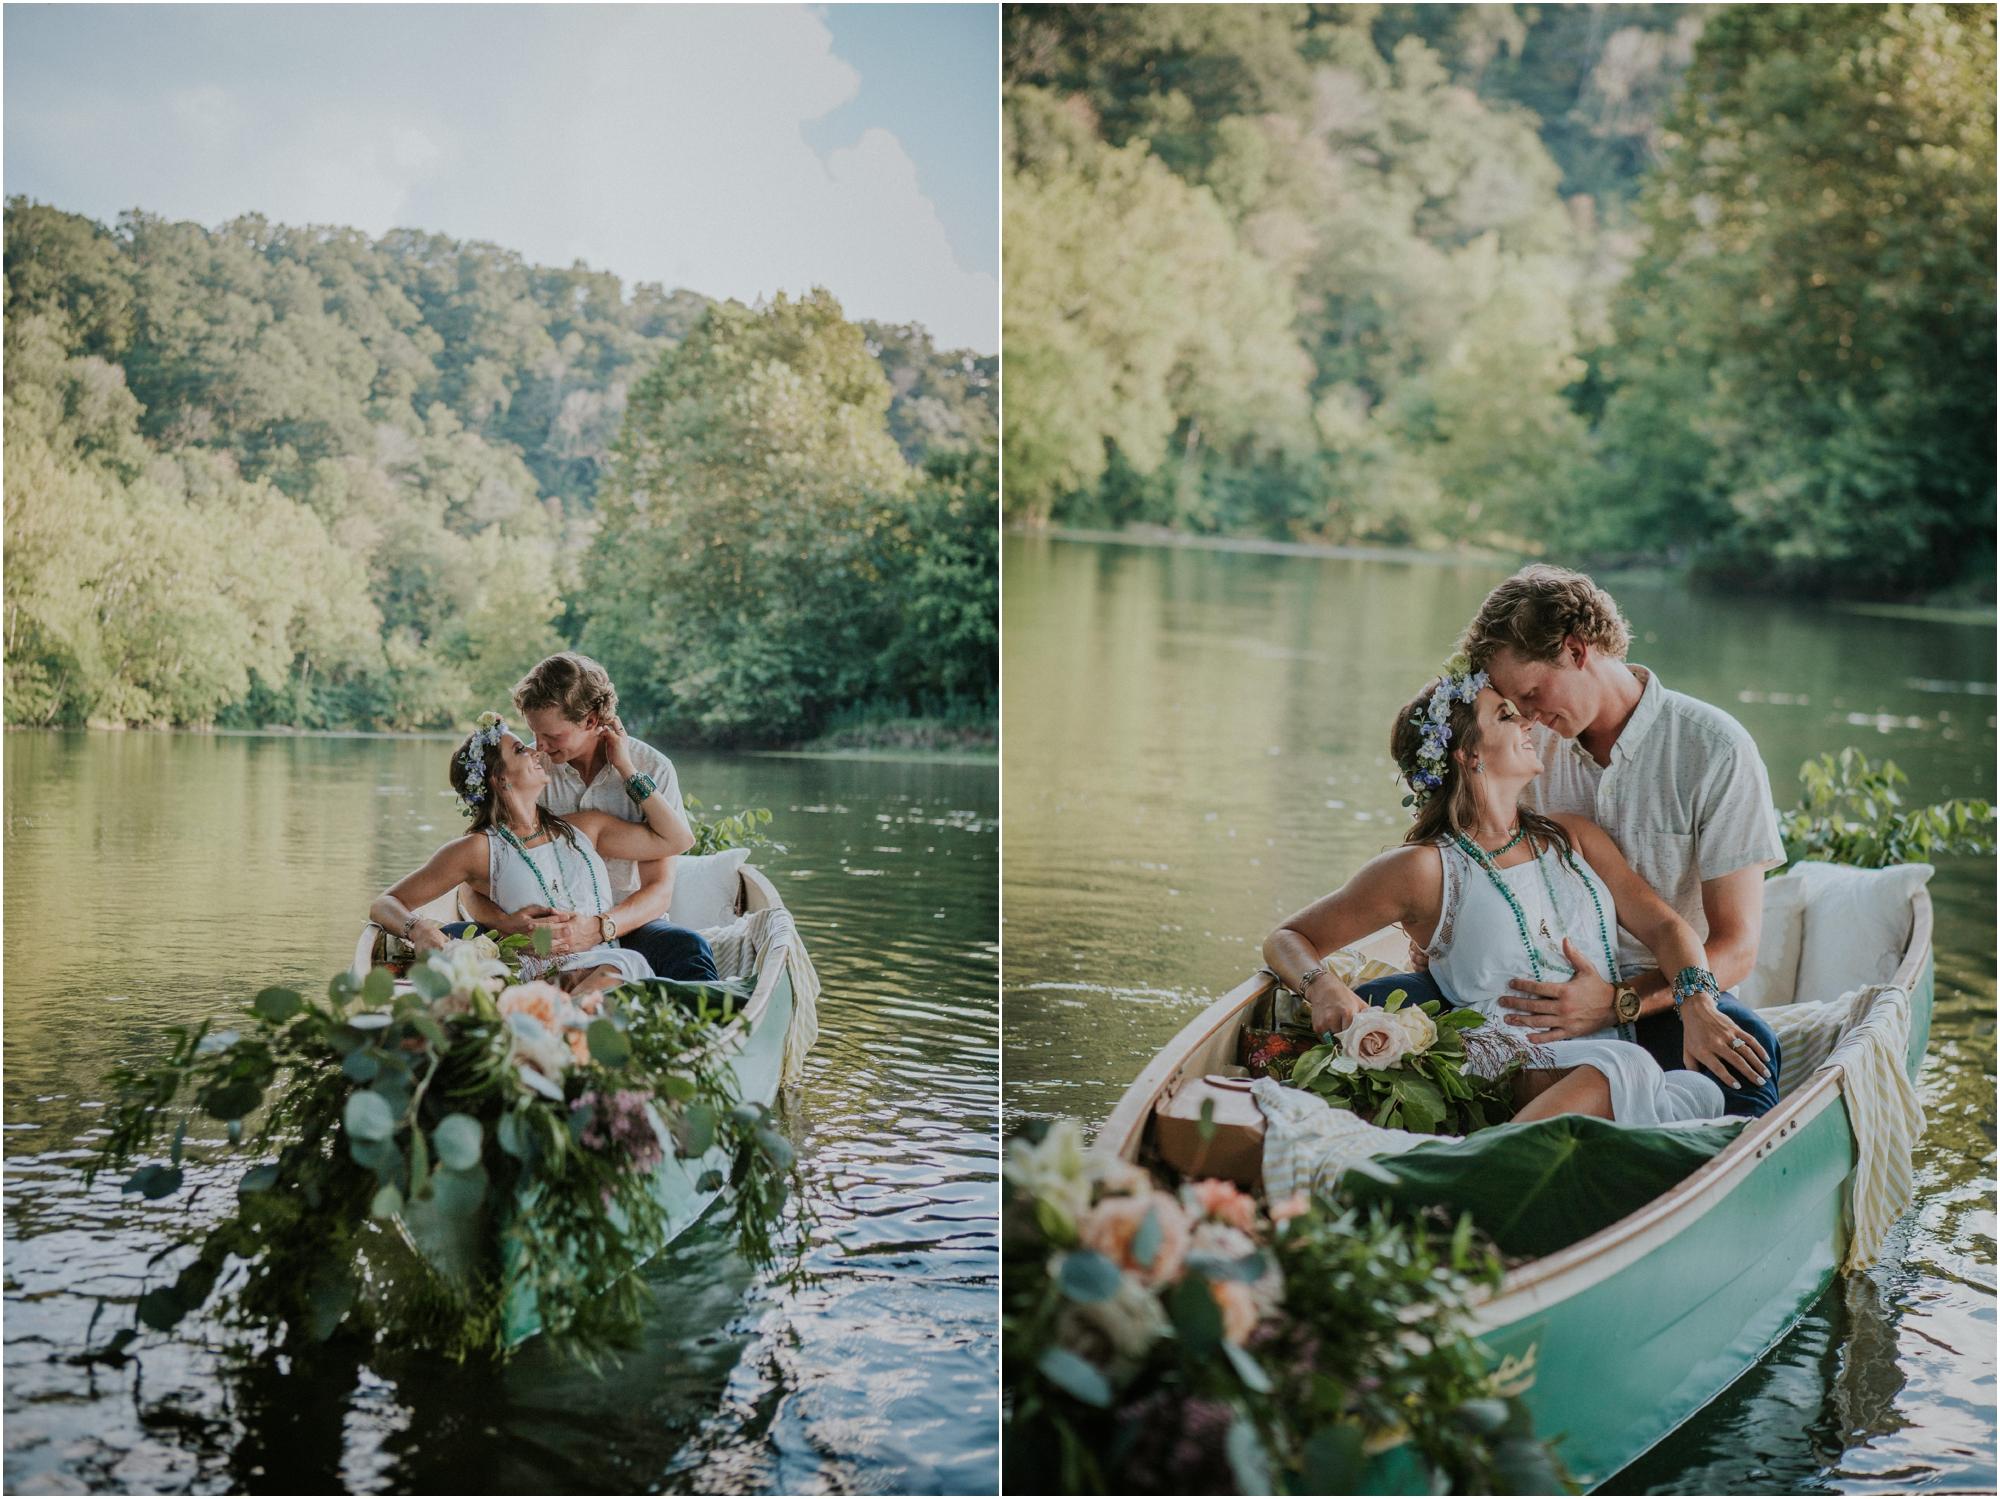 homestead-on-the-holston-hiltons-virginia-bohemian-canoe-styled-shoot-northeast-tennessee-elopement-wild-free-spirit_0016.jpg